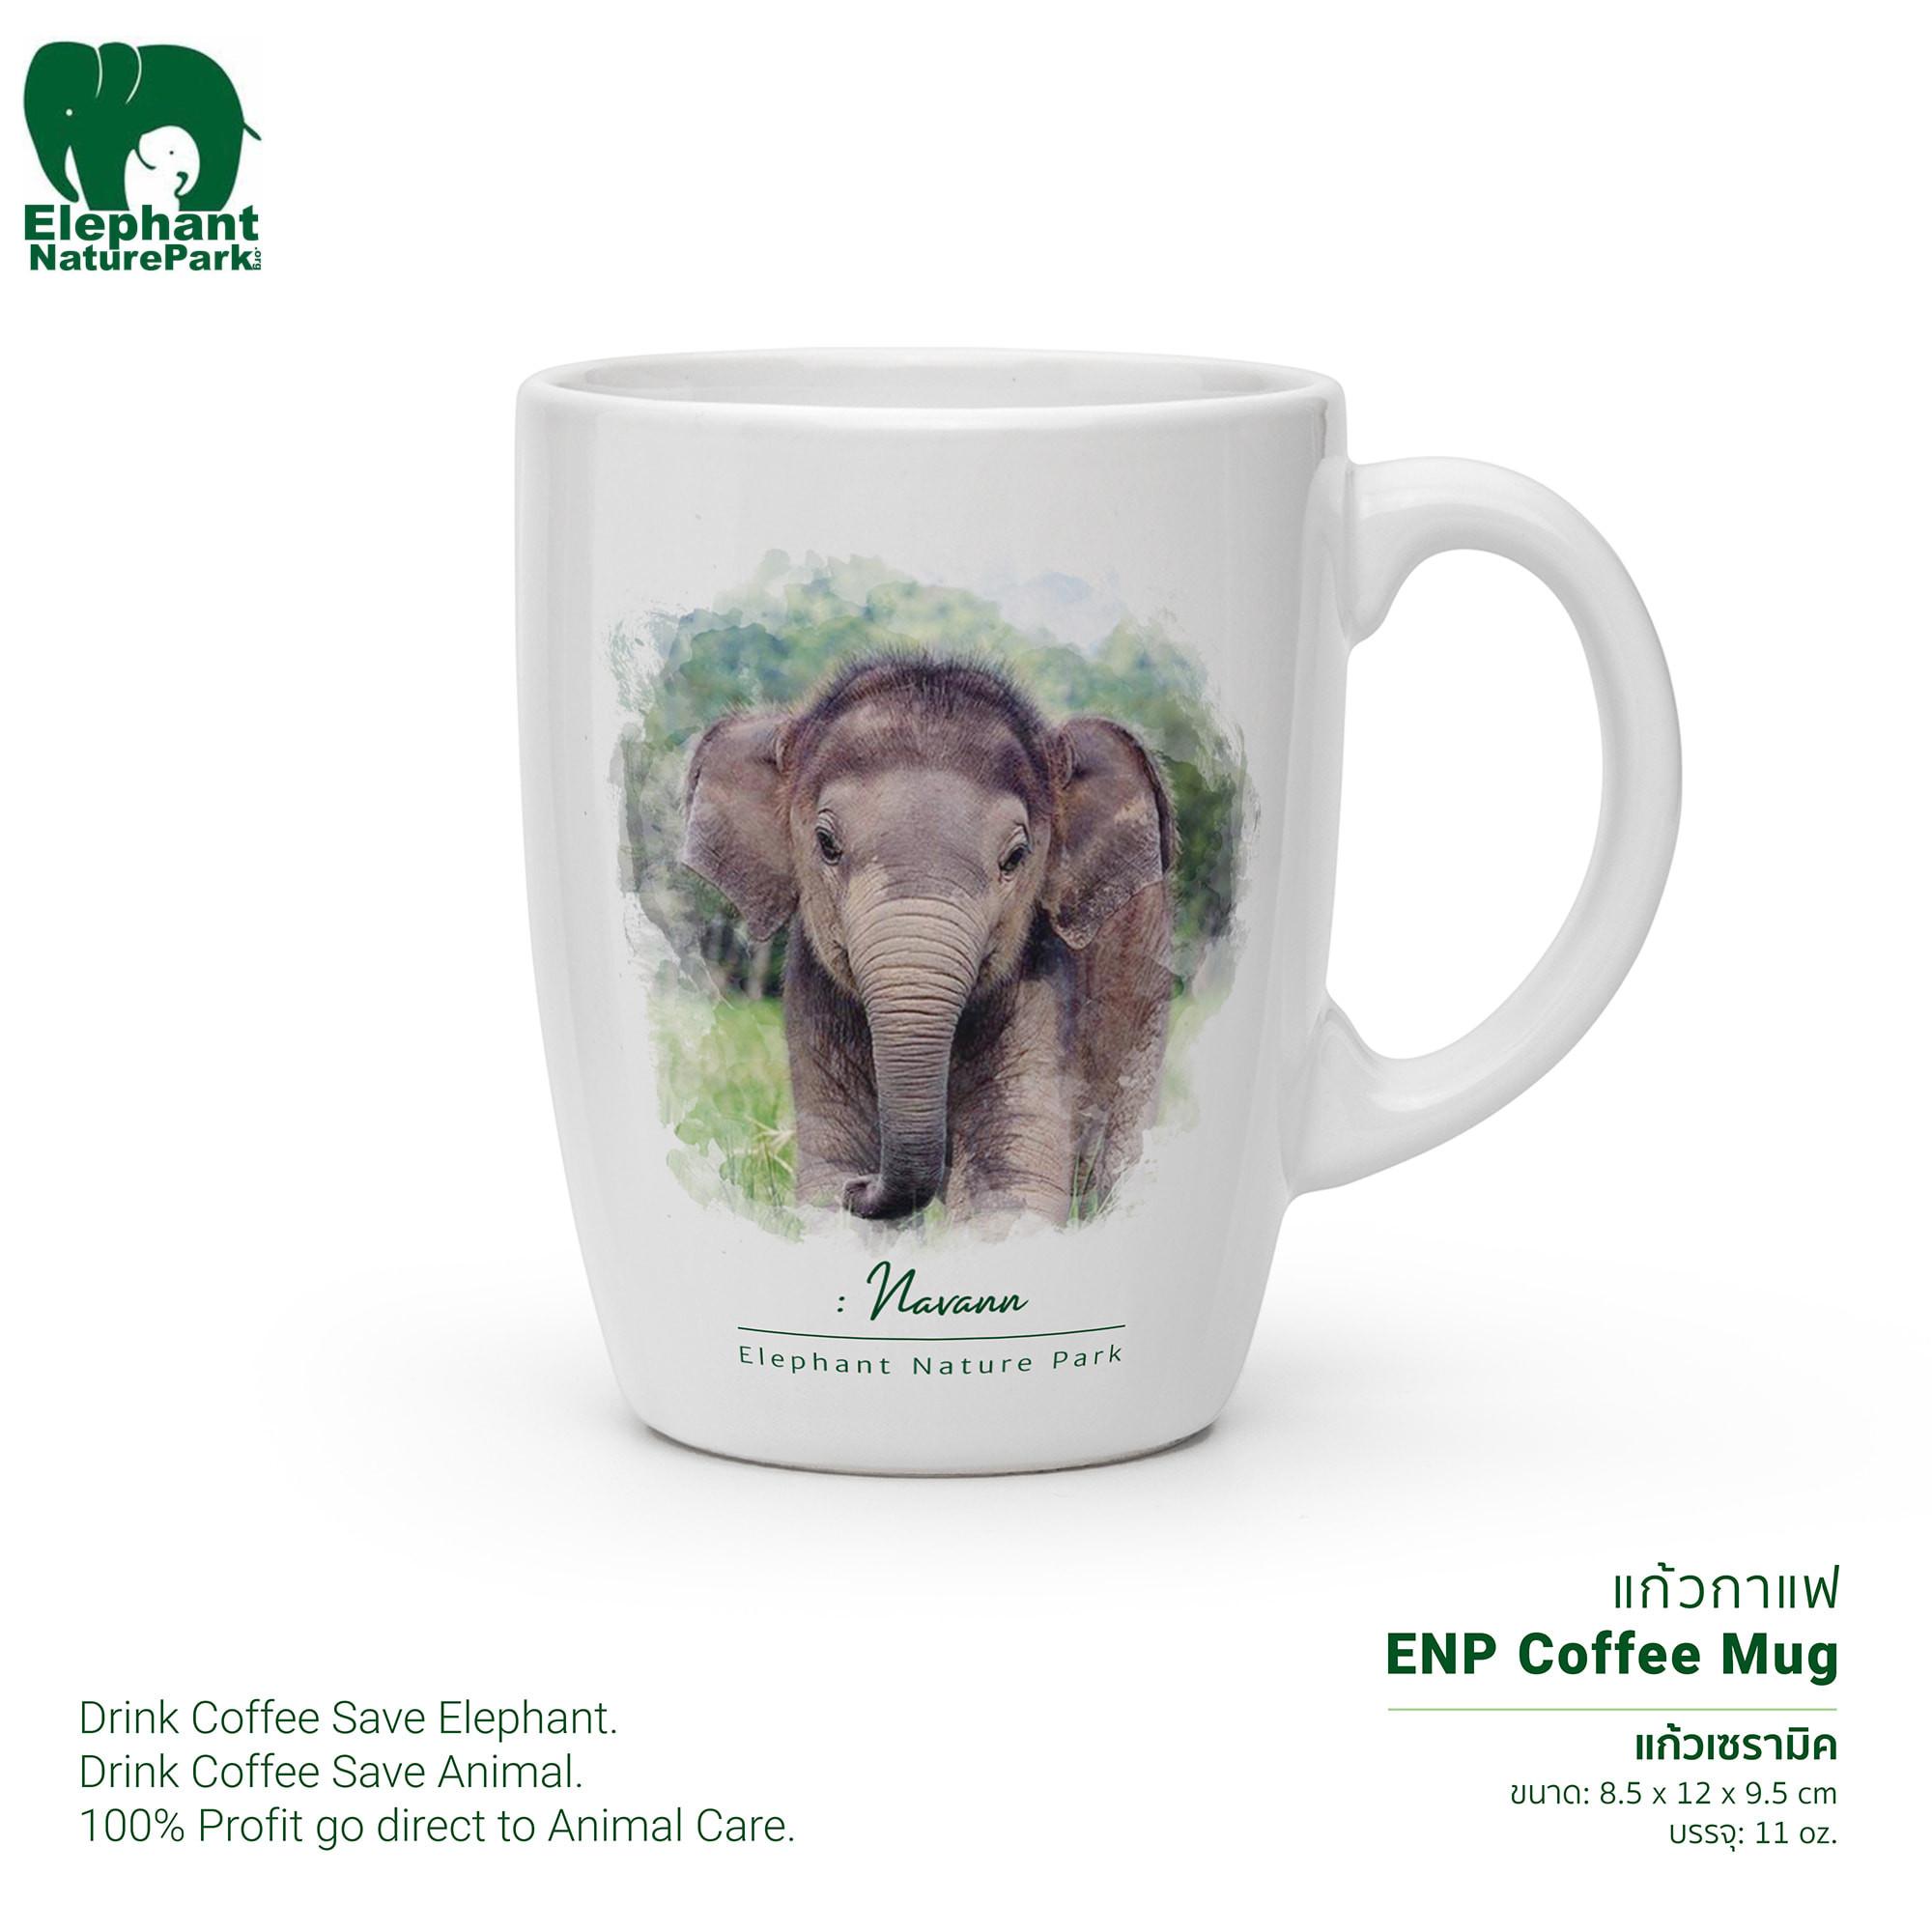 ENP Coffee Mug – Navann